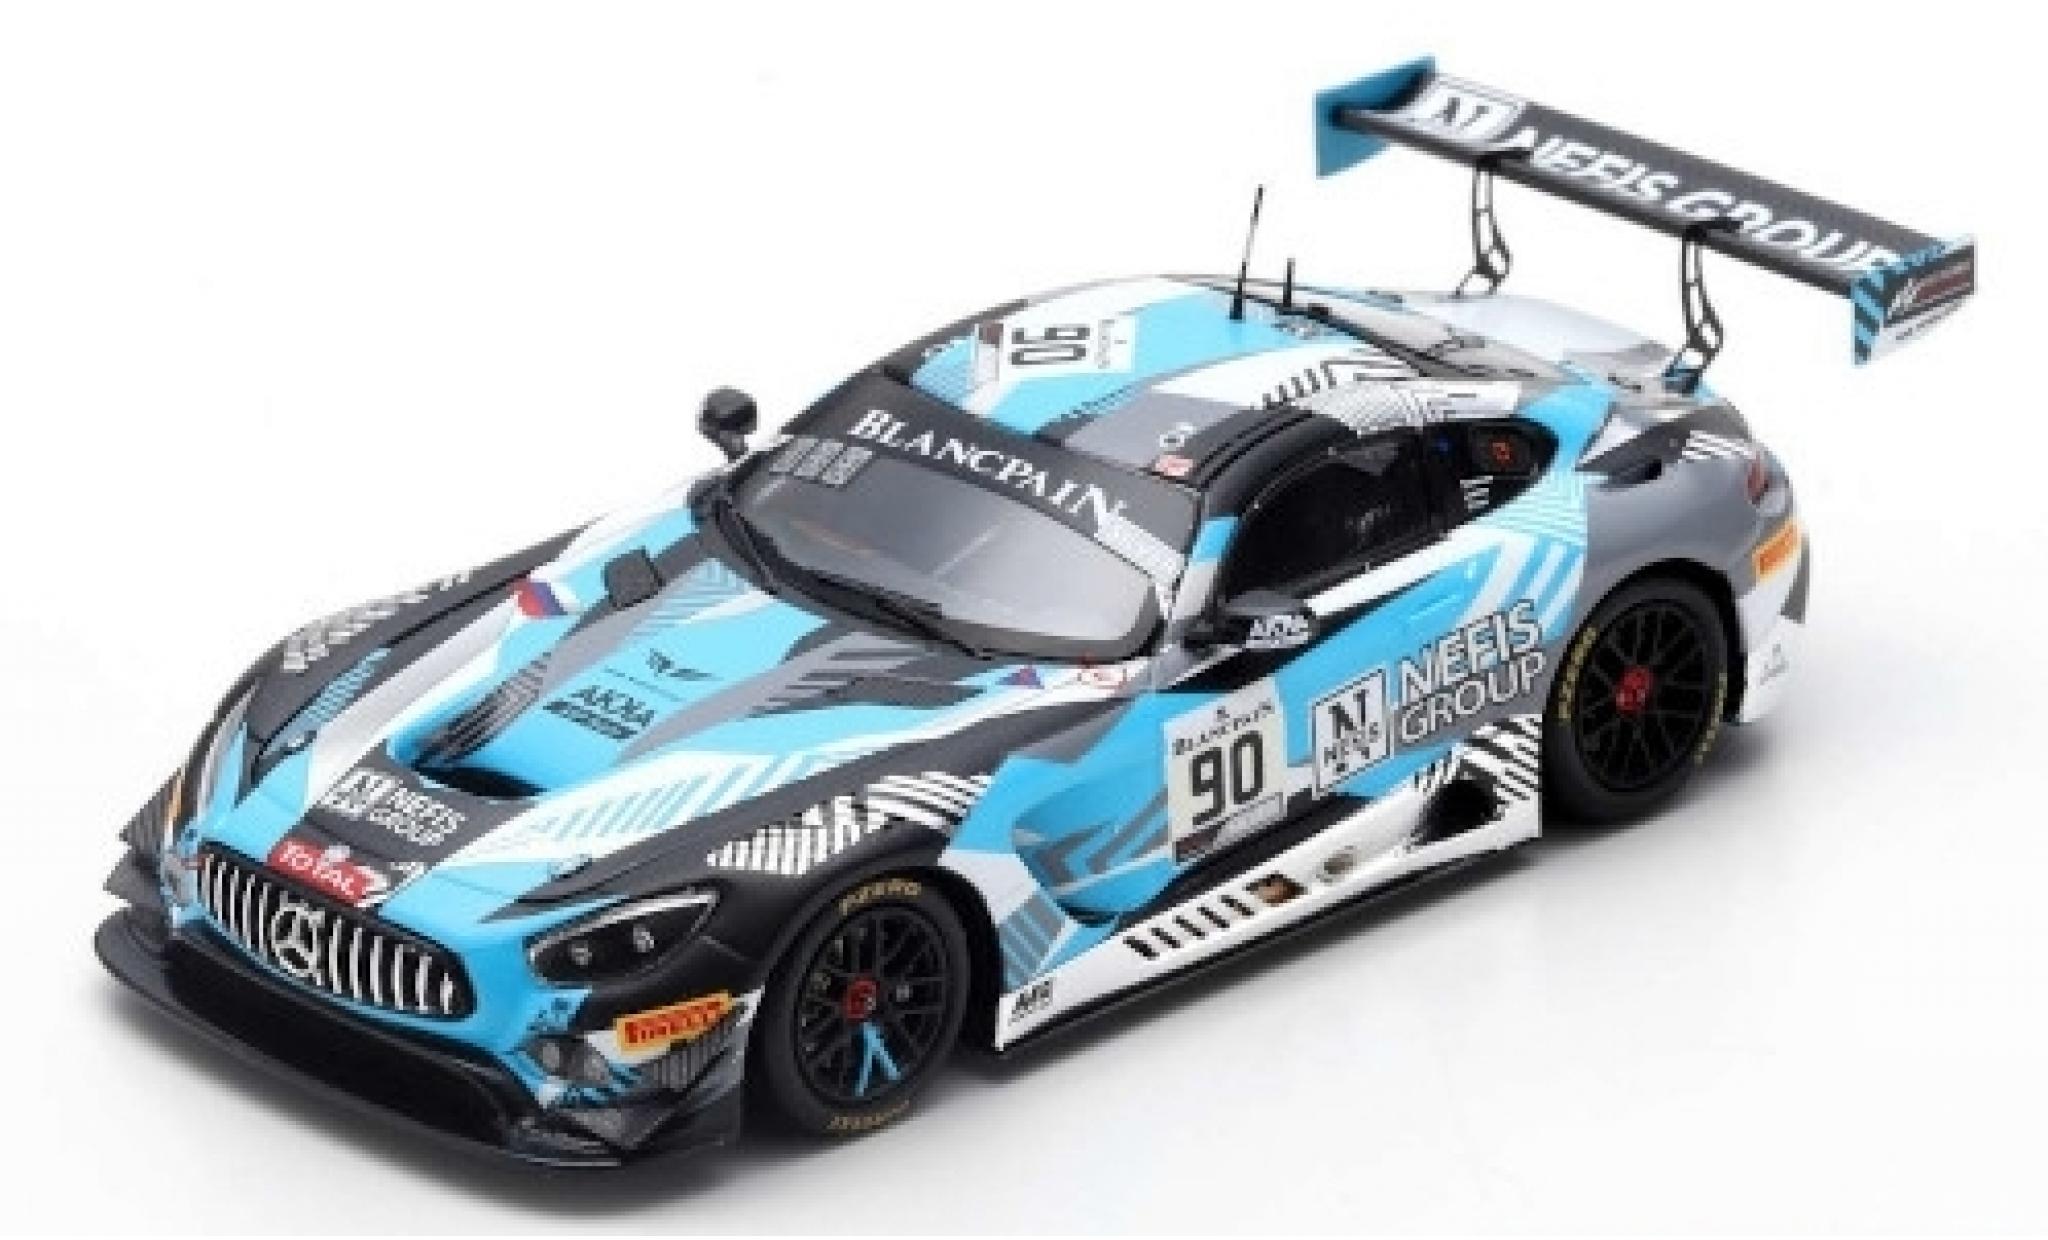 Mercedes AMG GT 1/43 Spark 3 No.90 Akka ASP Team Nefis Group 24h Spa 2019 N.Bastian/T.Boguslavskiy/F.Fraga